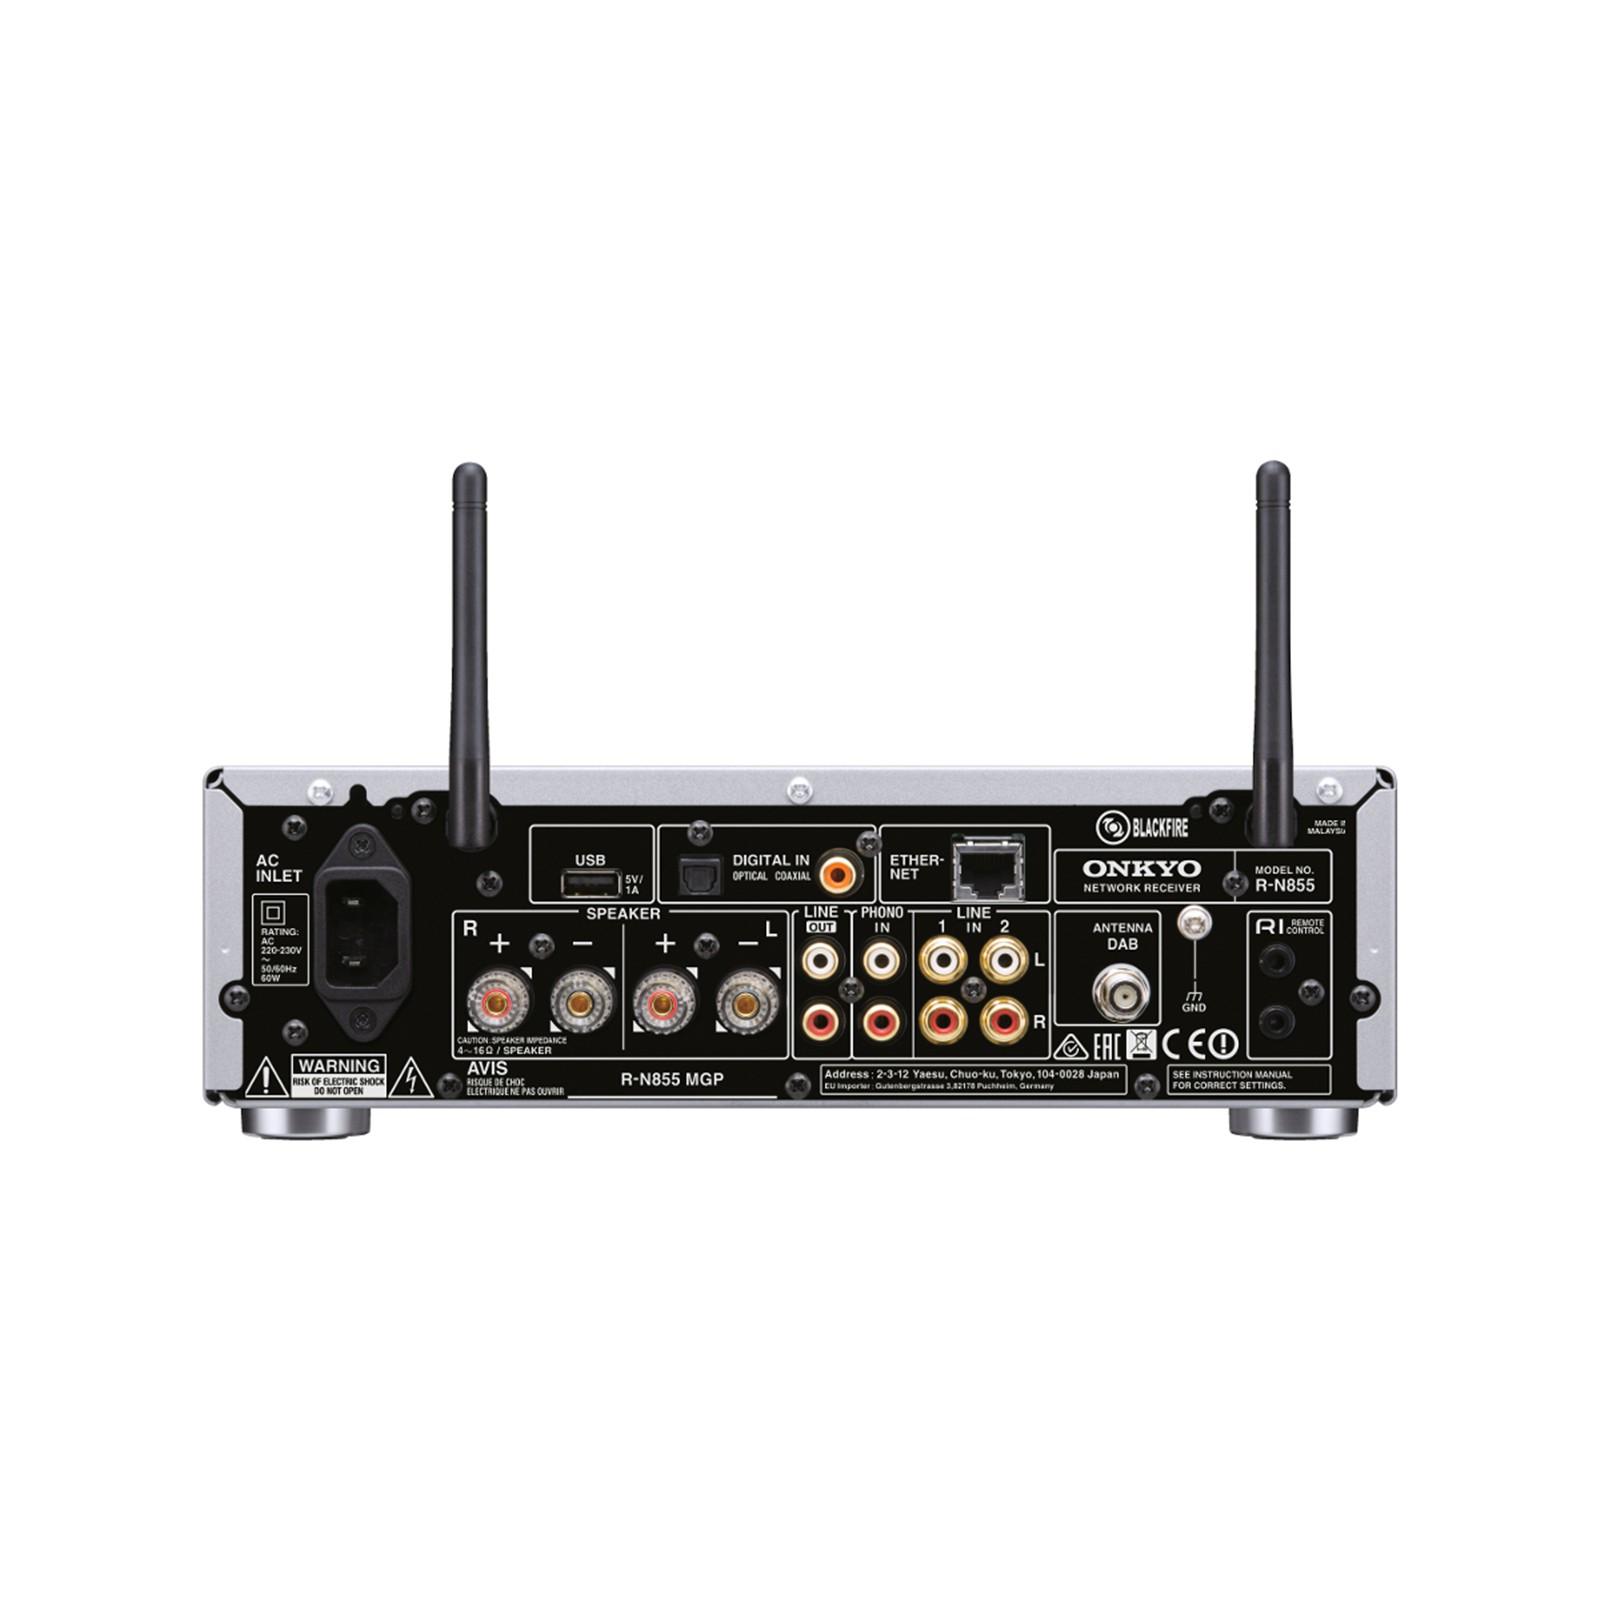 Buy the Onkyo R-N855 Stereo Network Receiver - Hi-Res Audio via